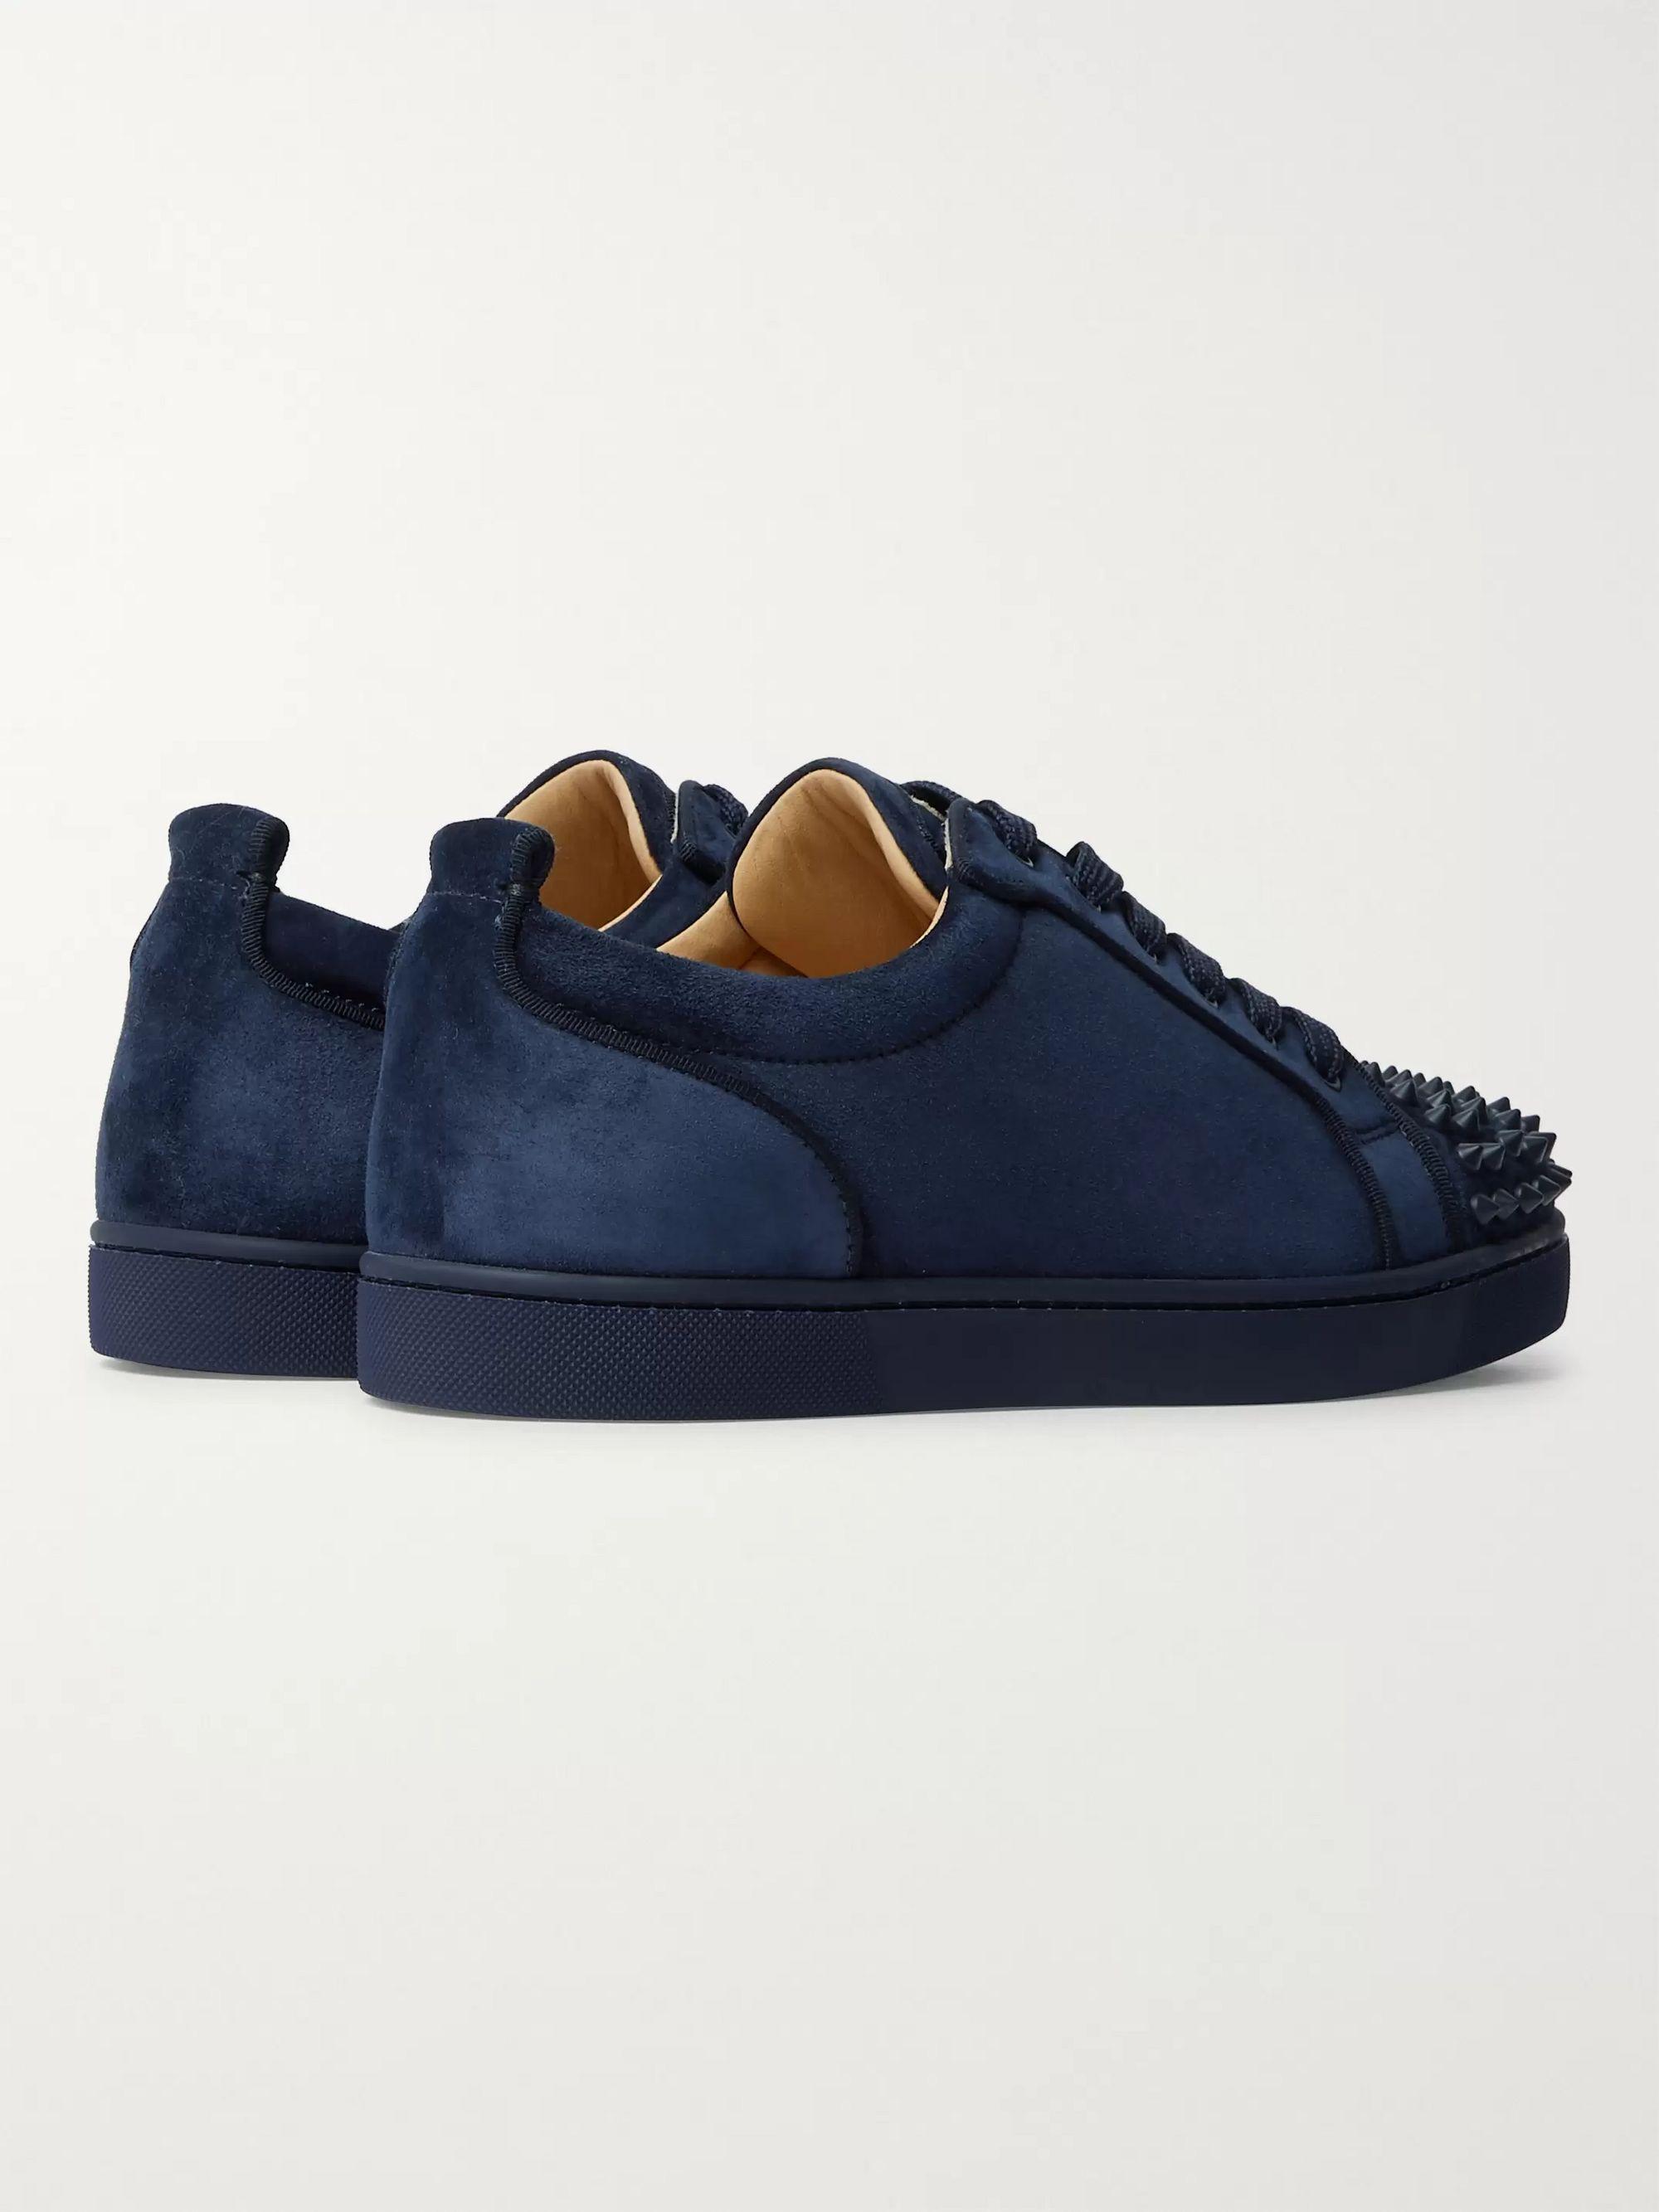 Navy Louis Junior Spikes Cap-toe Suede Sneakers | Christian Louboutin